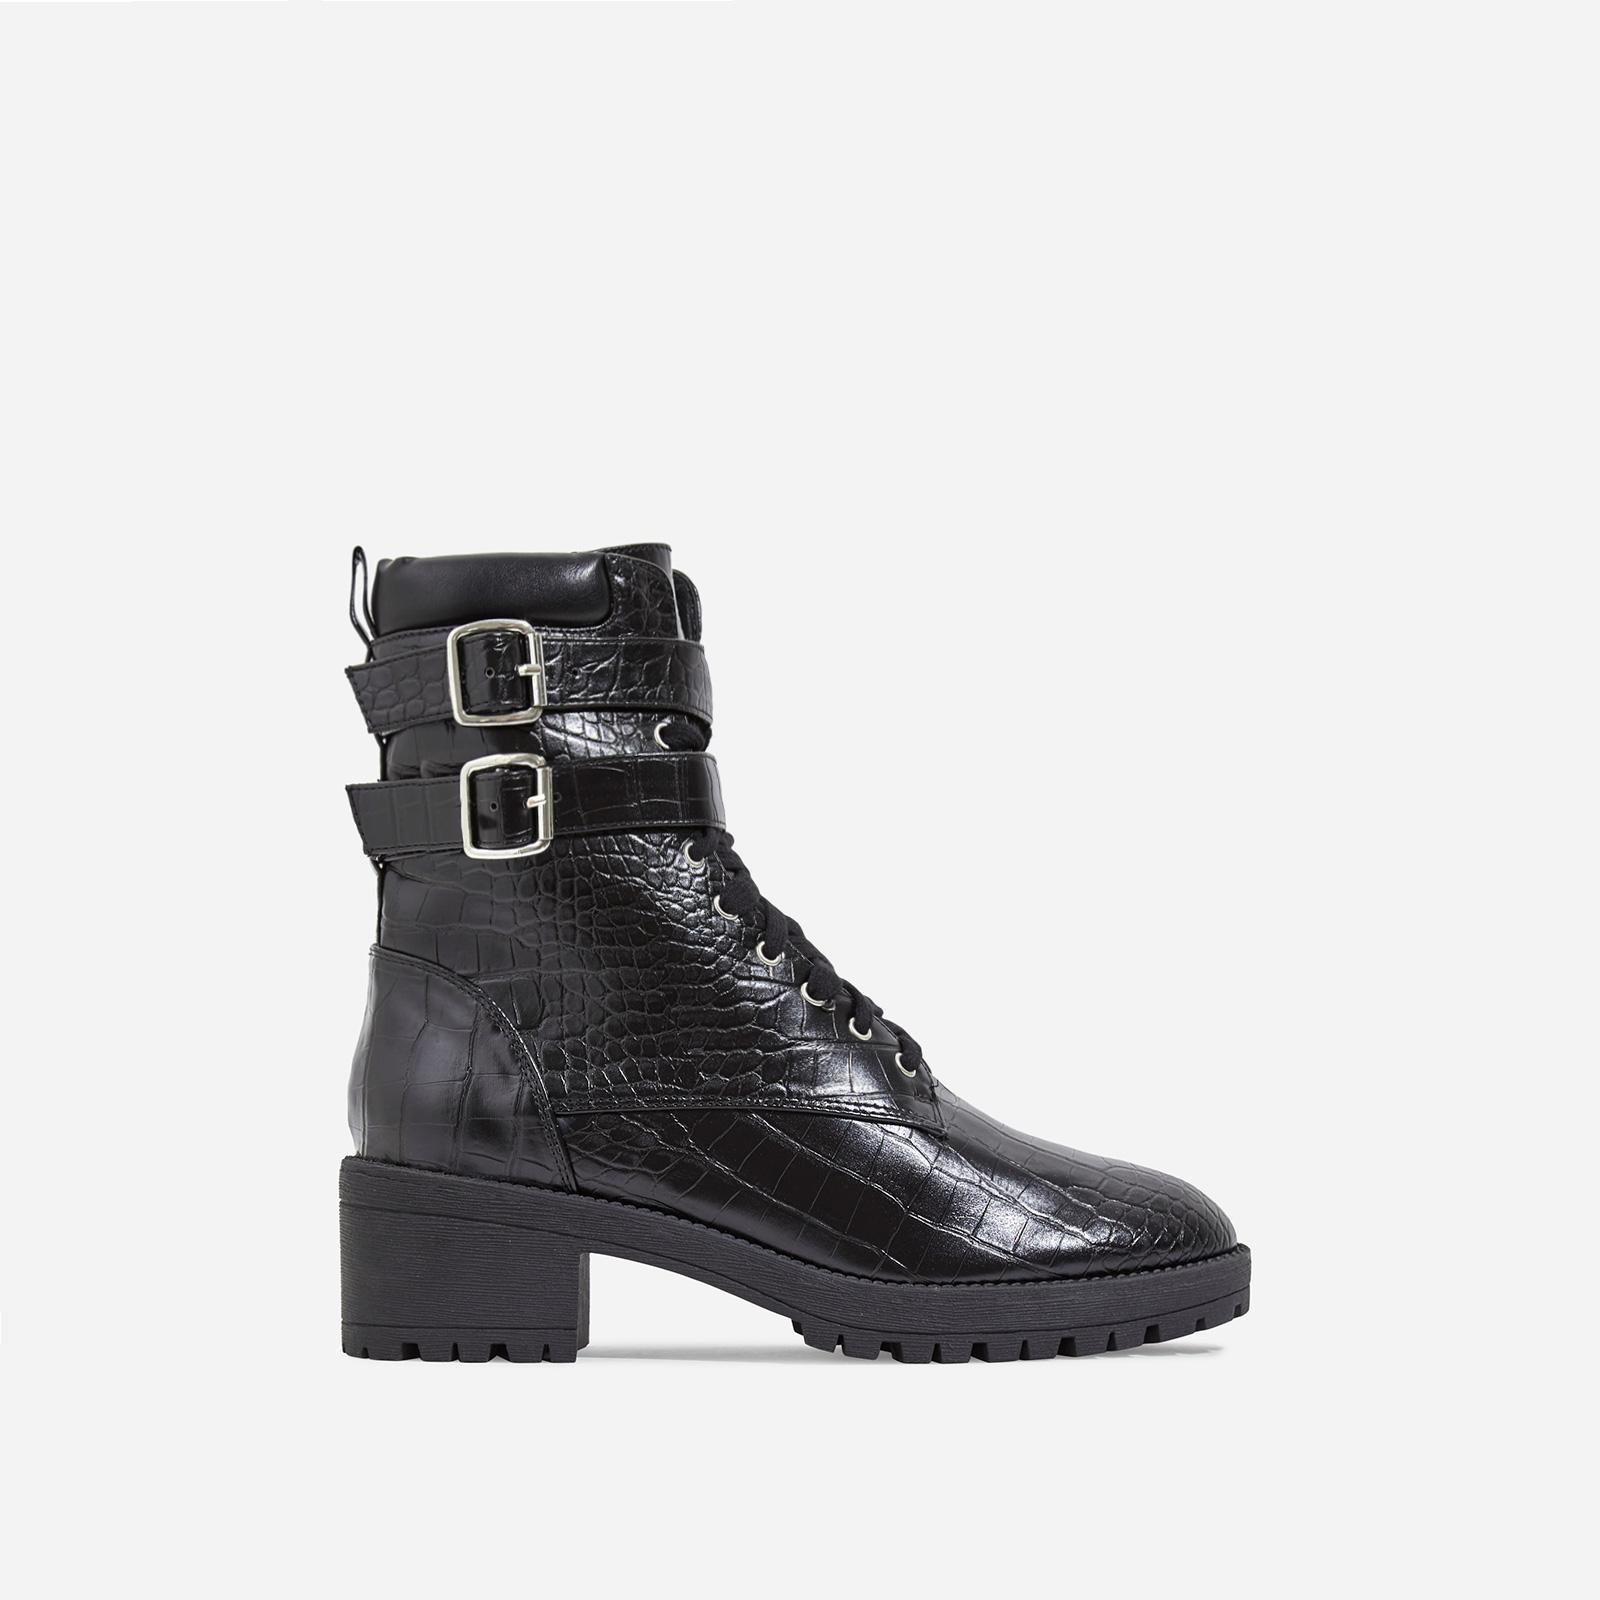 Jovi Lace Up Ankle Biker Boot In Black Croc Print Faux Leather